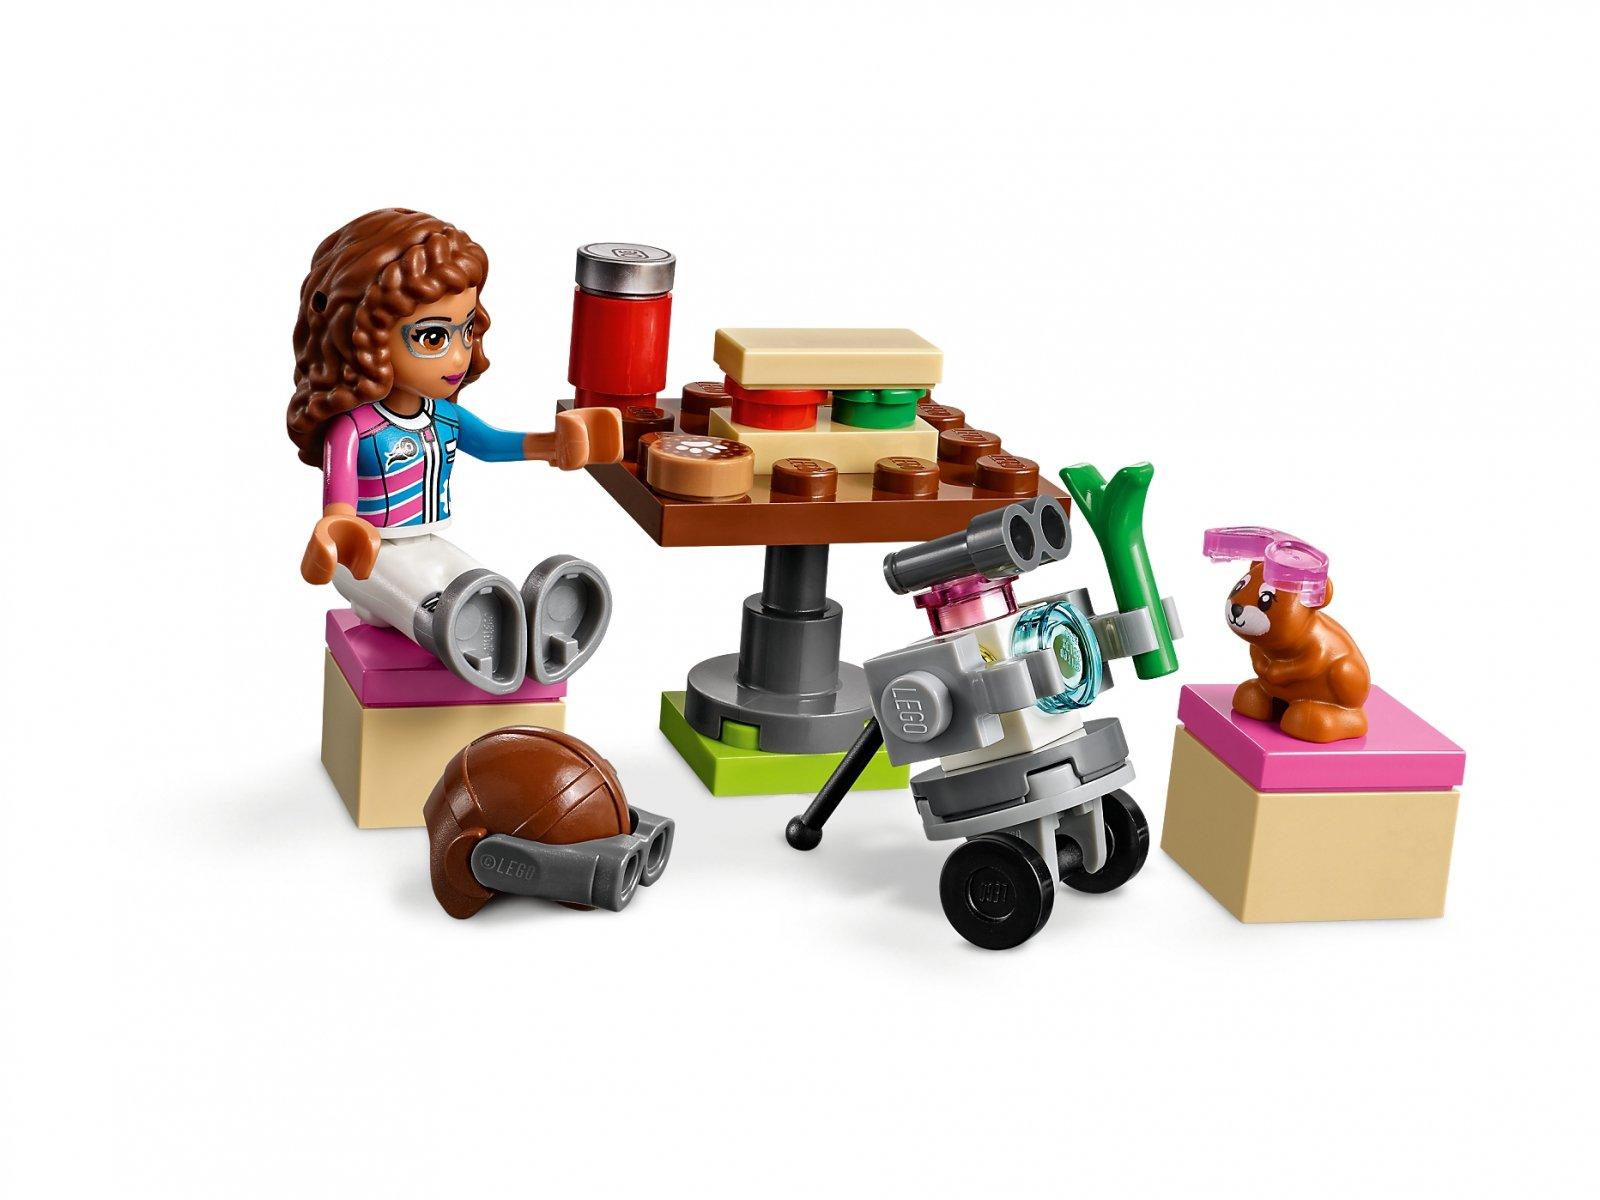 LEGO 41343 Lot samolotem nad Miastem Heartlake